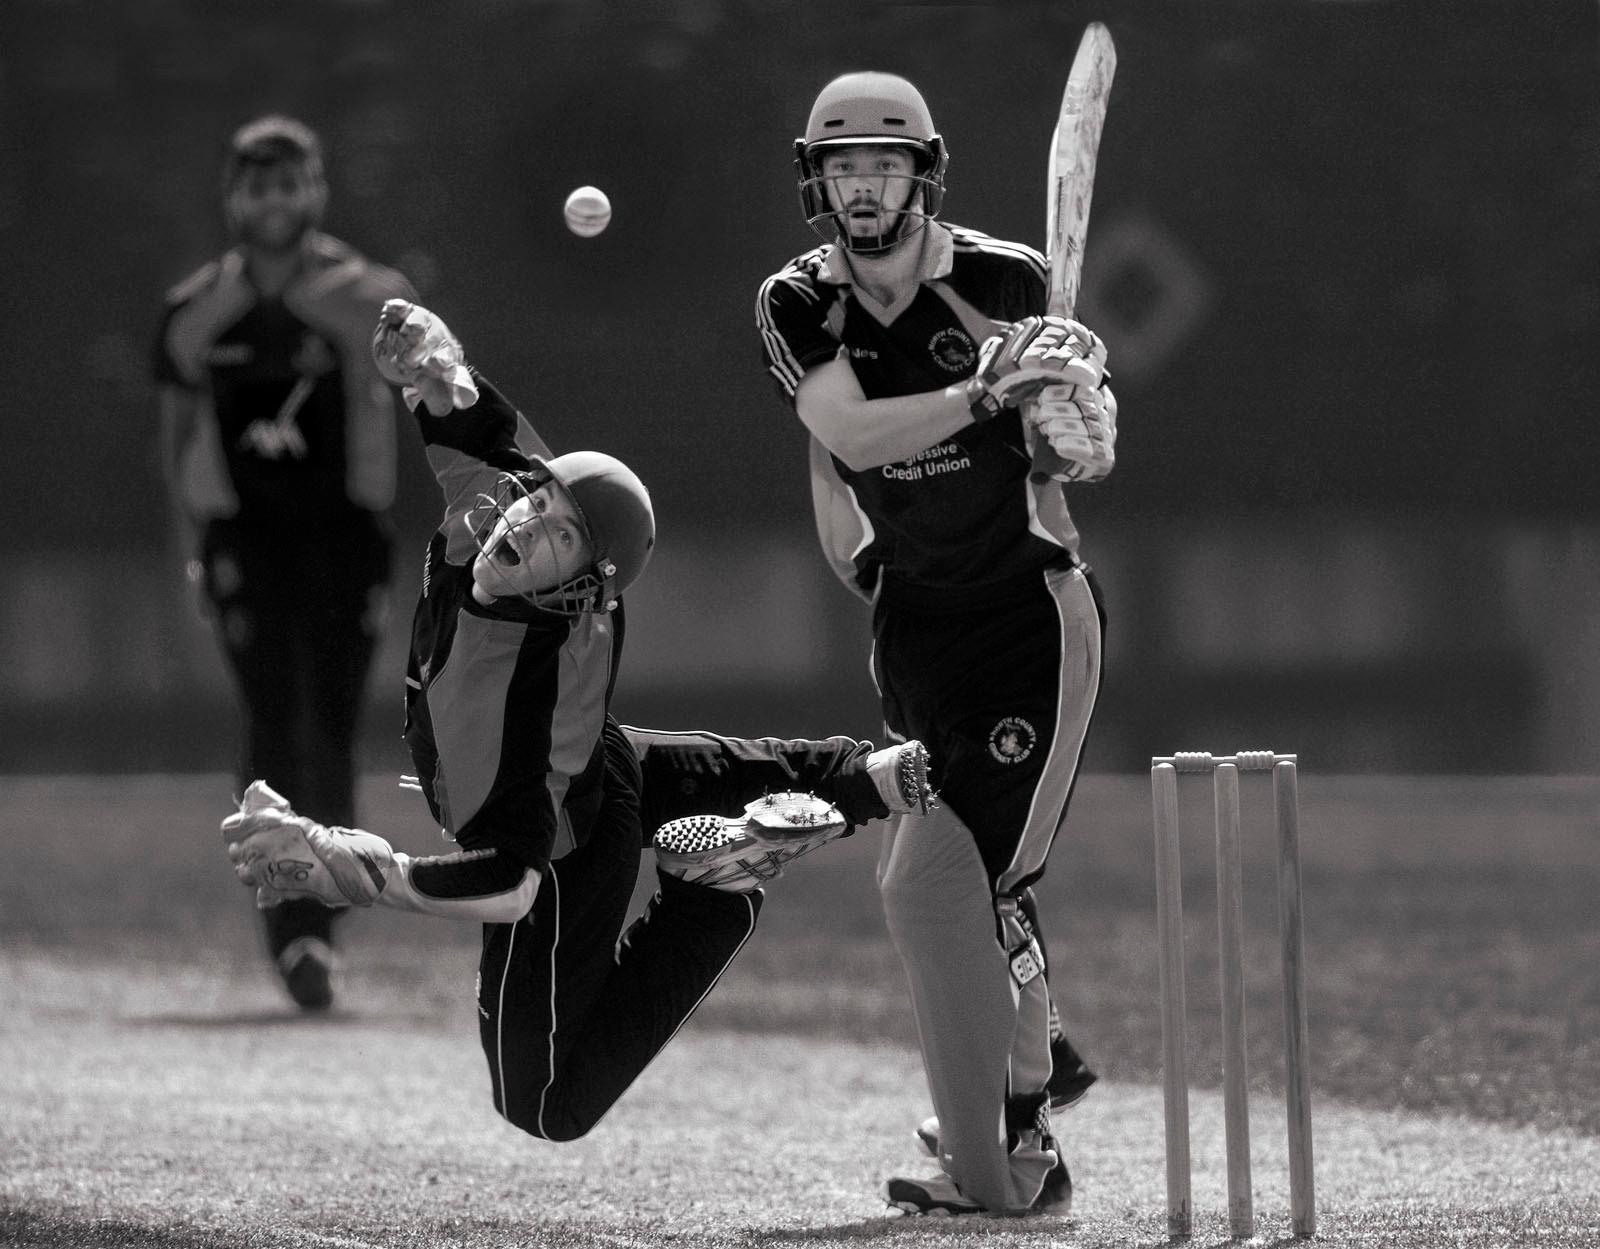 MONO - Cricket Dive by Joe Curtis (15 marks)